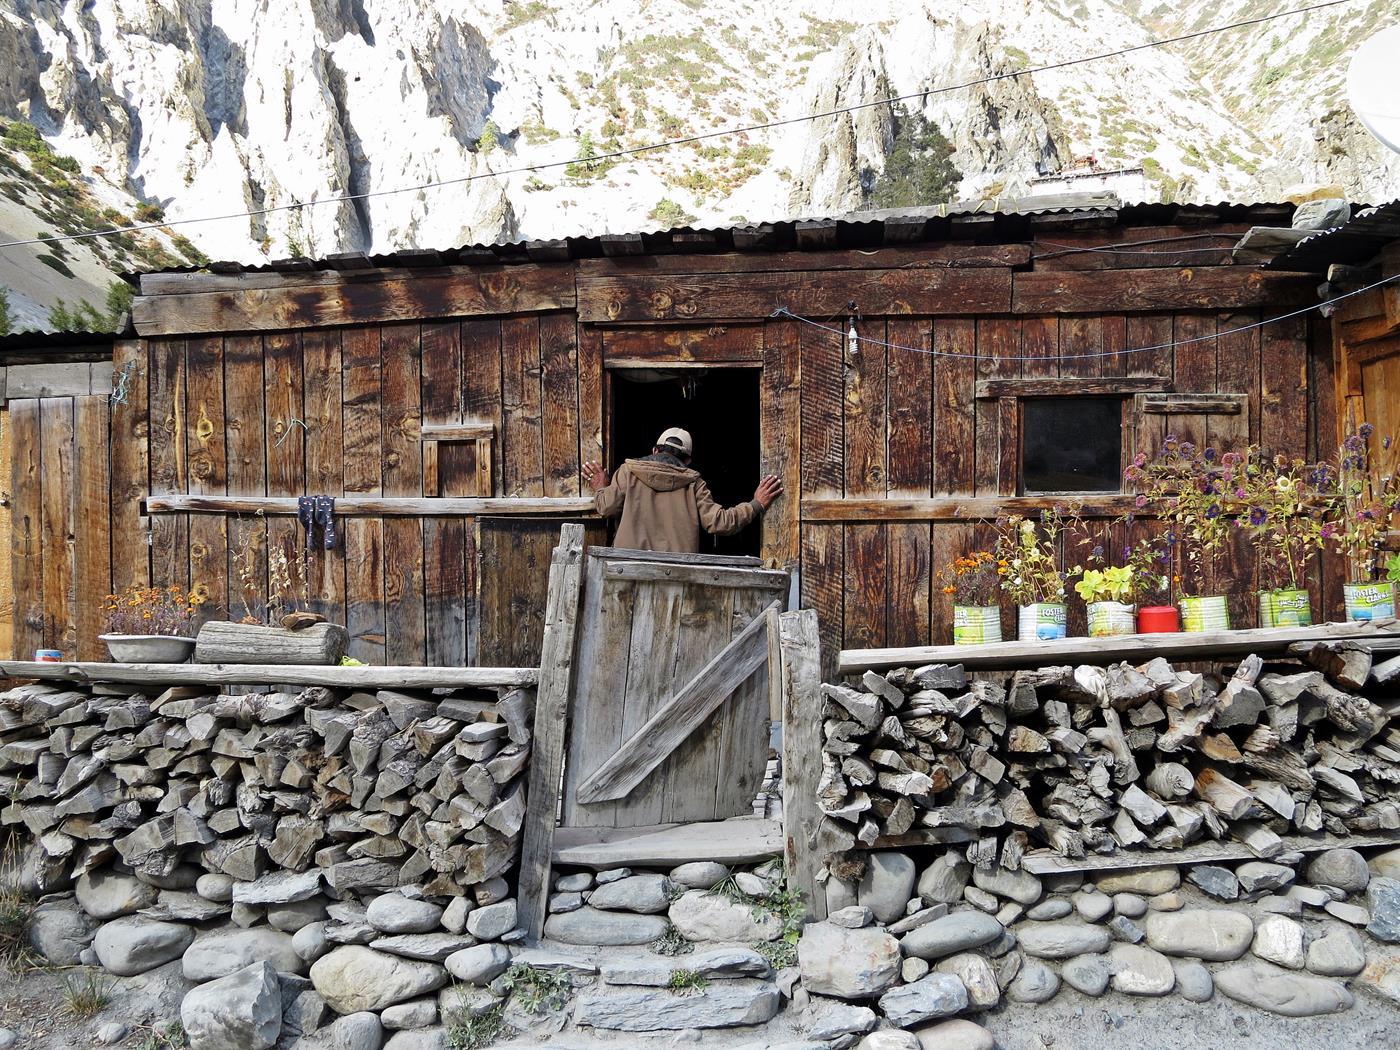 Annapurna Umrundung